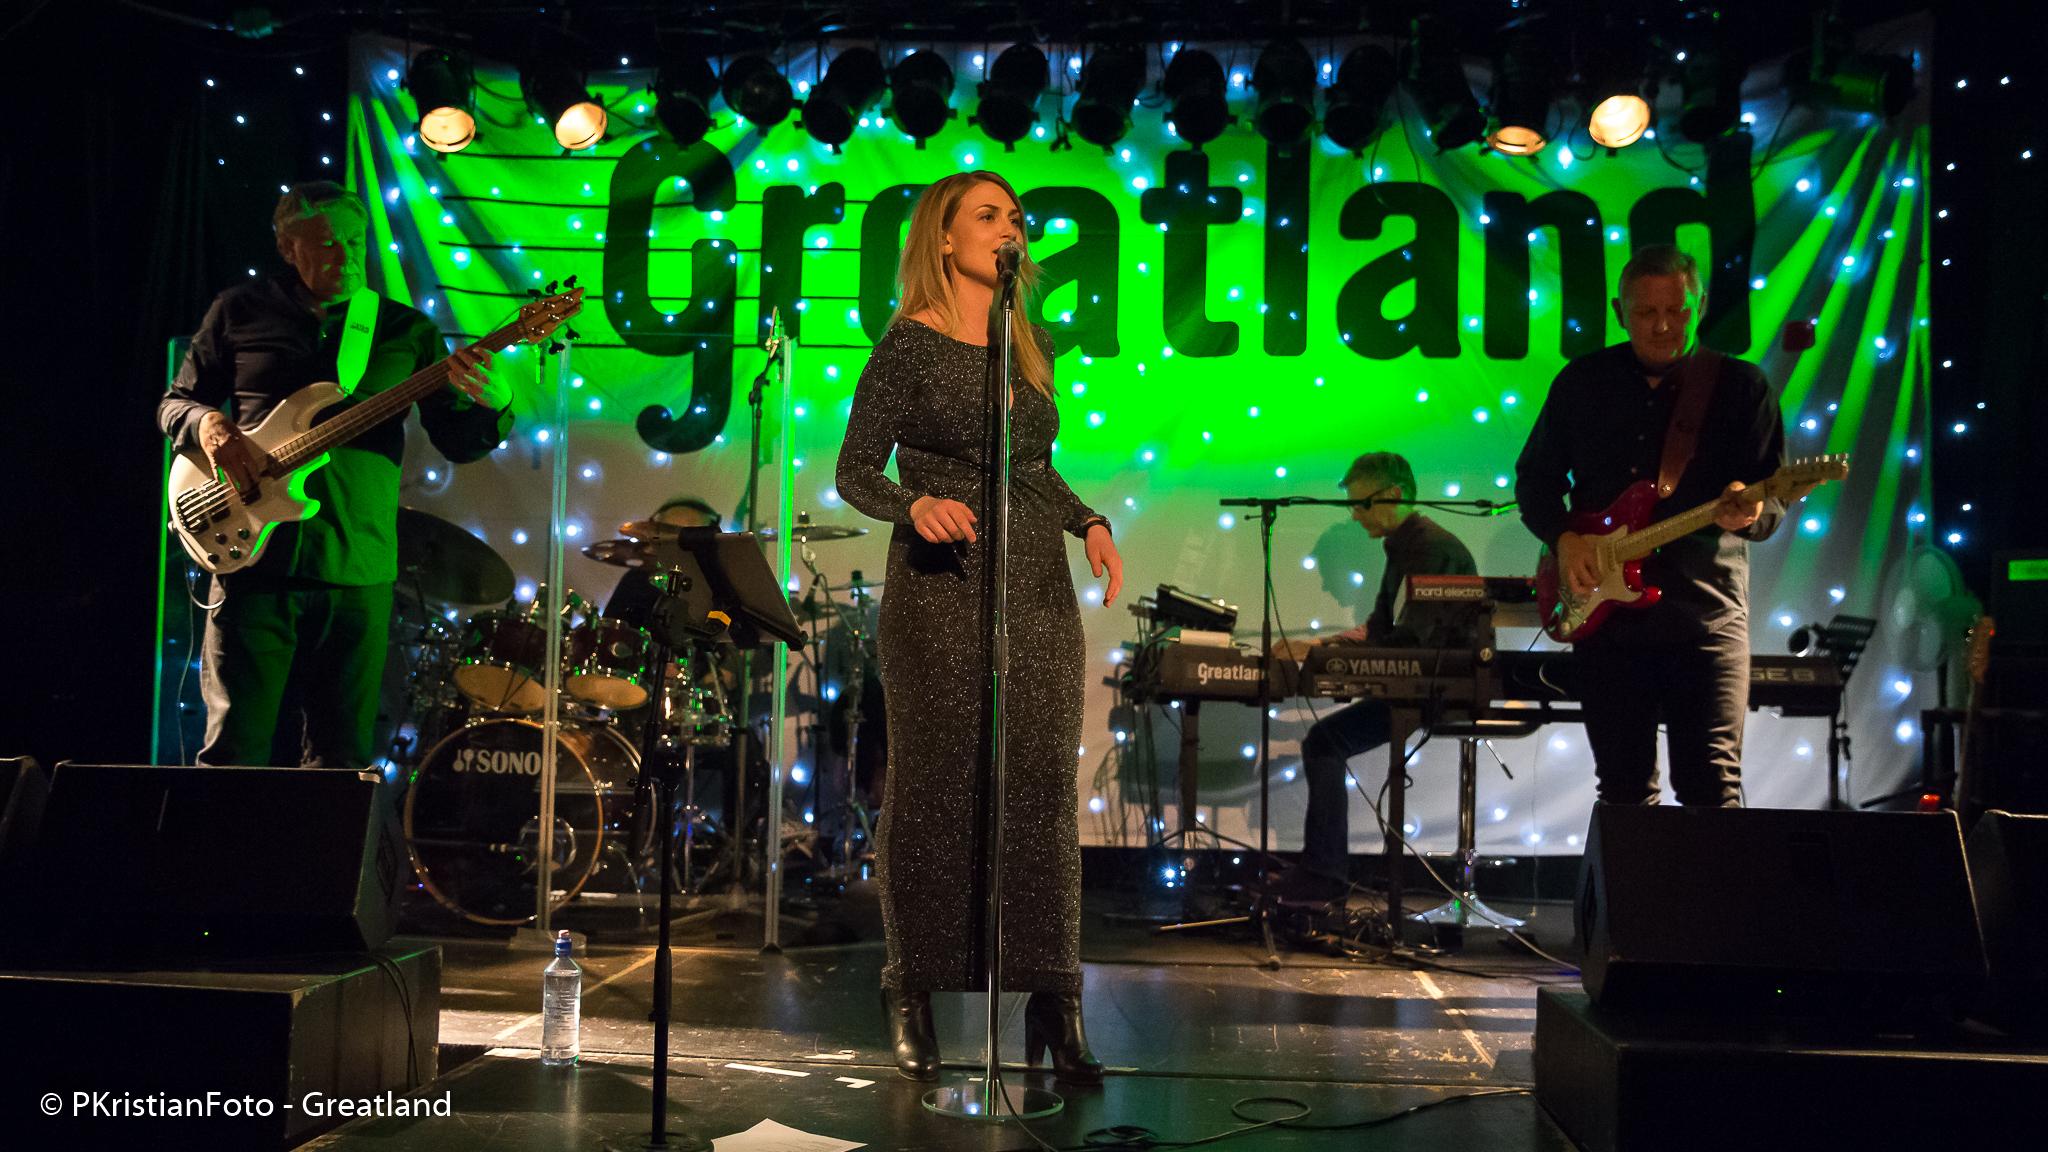 2016.12.03 Greatland - Gamlebyen Kulturhus - 185 - 16x9